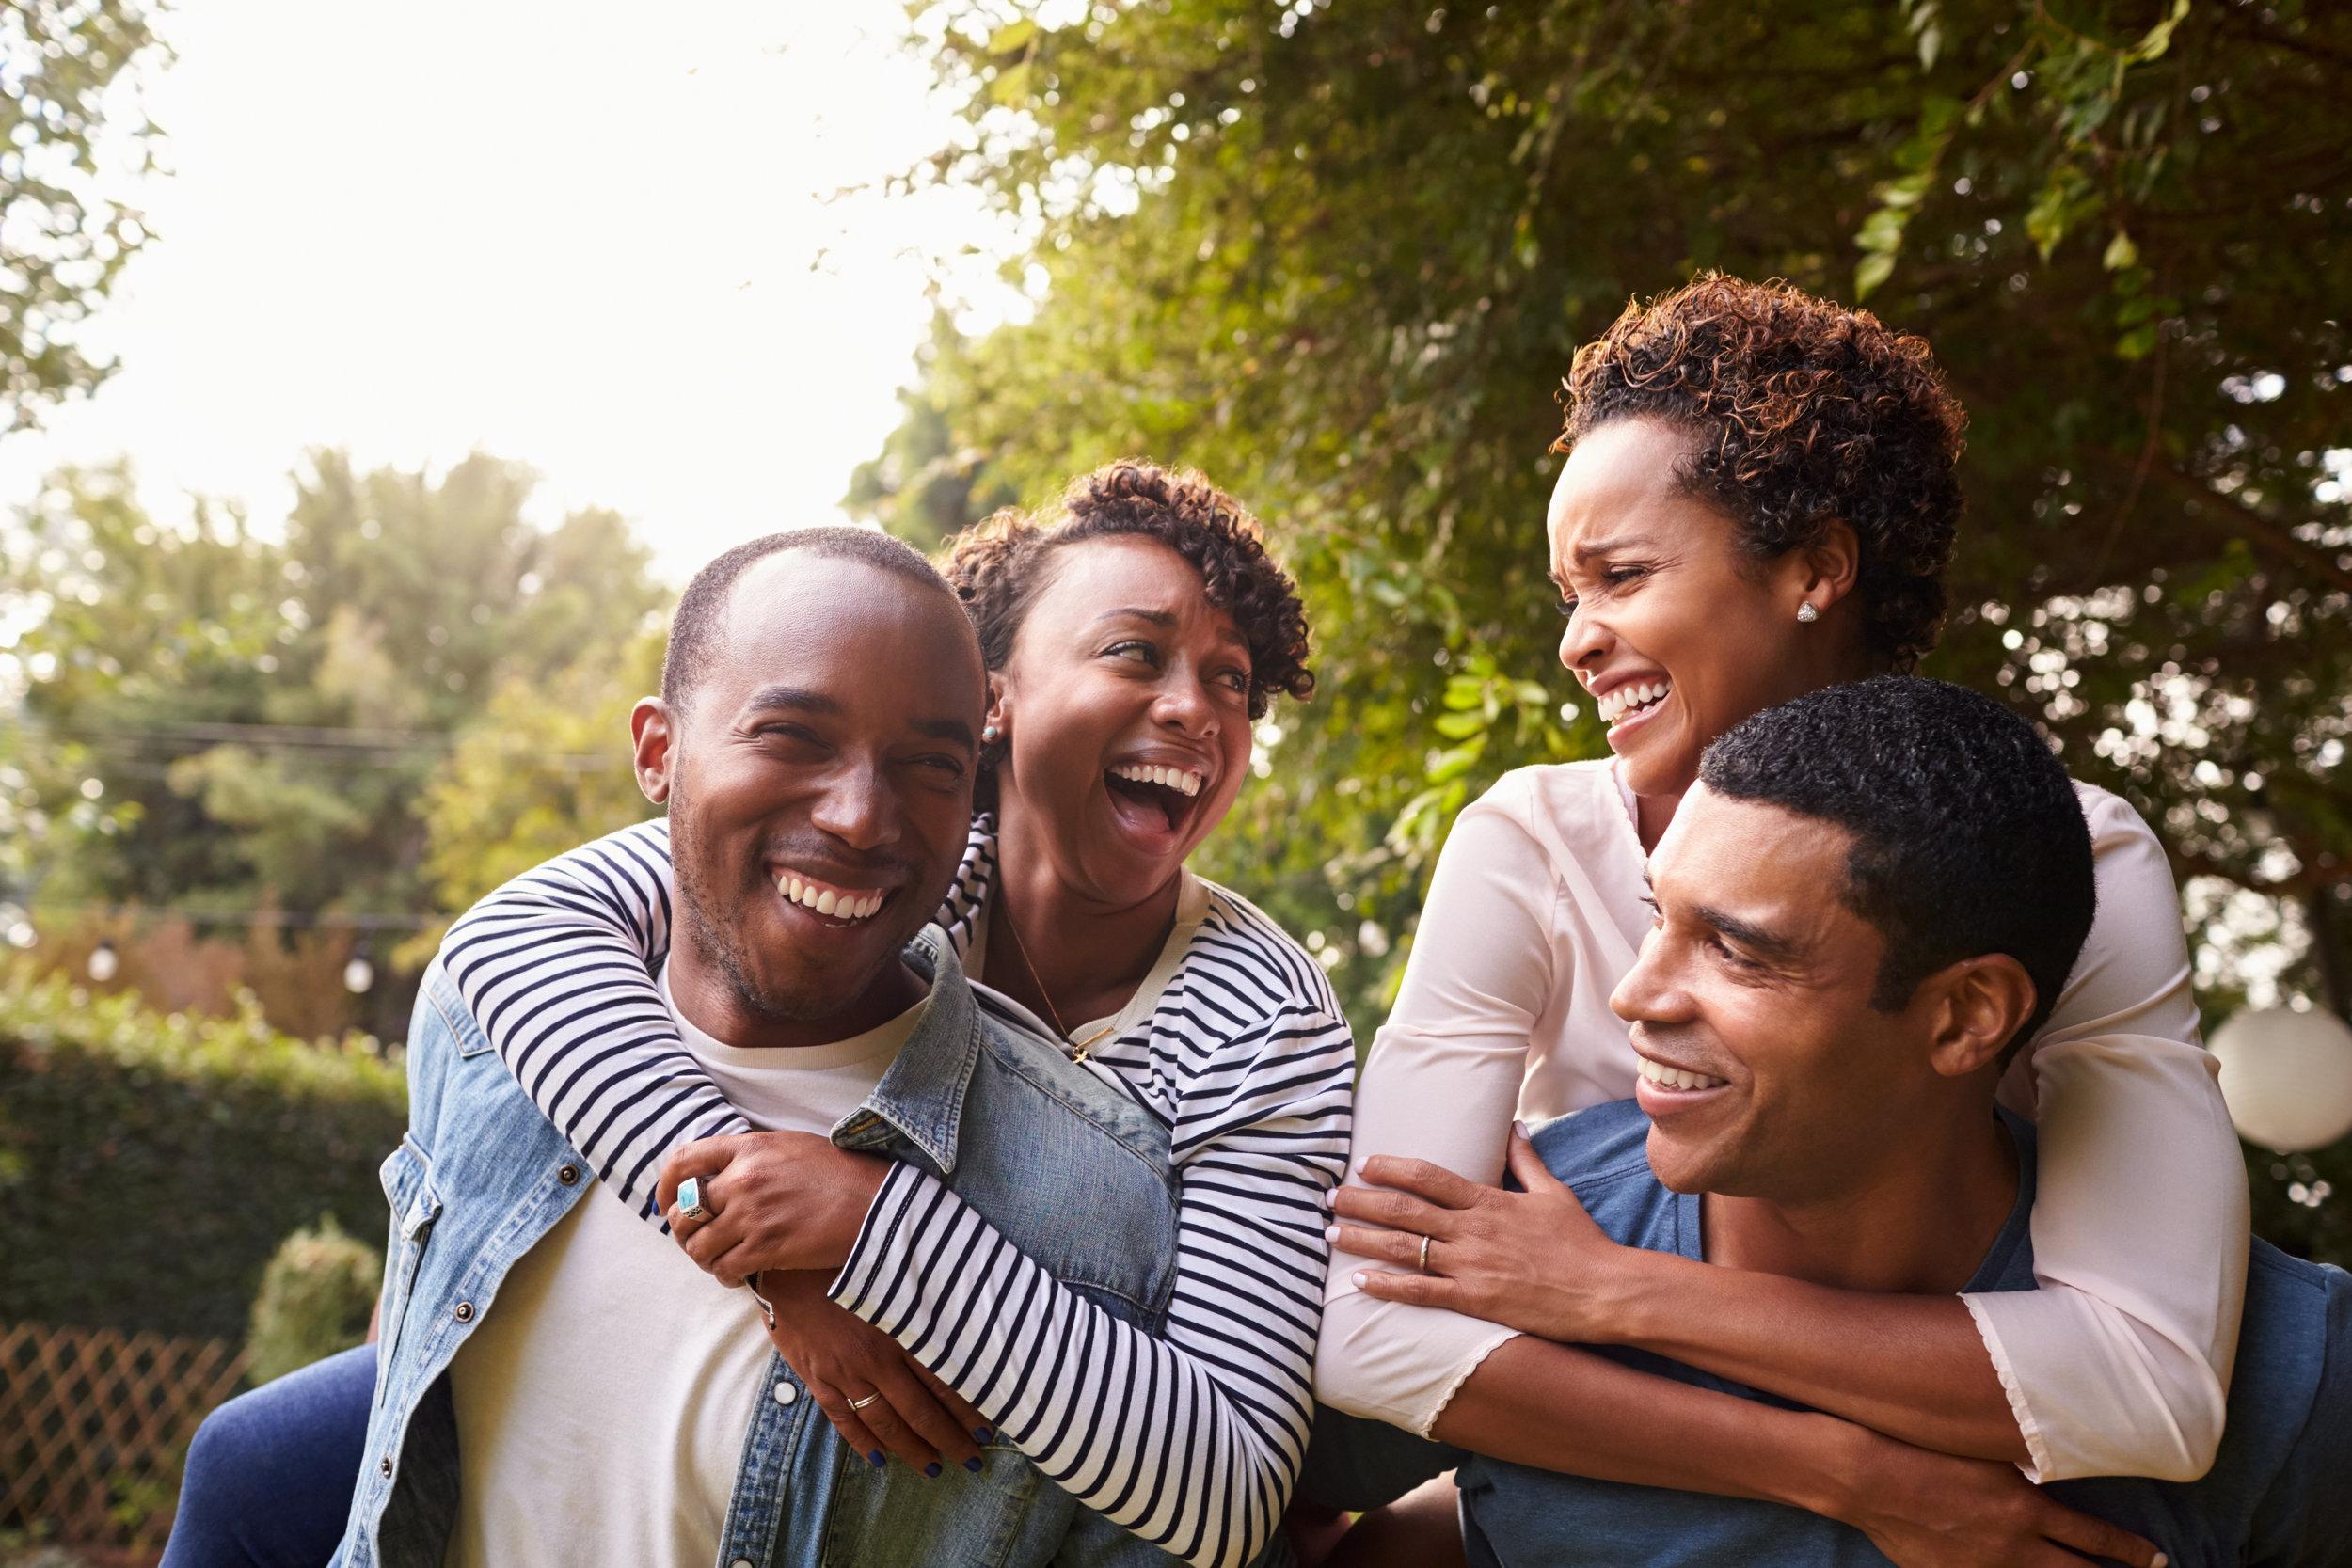 Study Finds Older Black Millennials Lag Behind Other Groups in Building Wealth